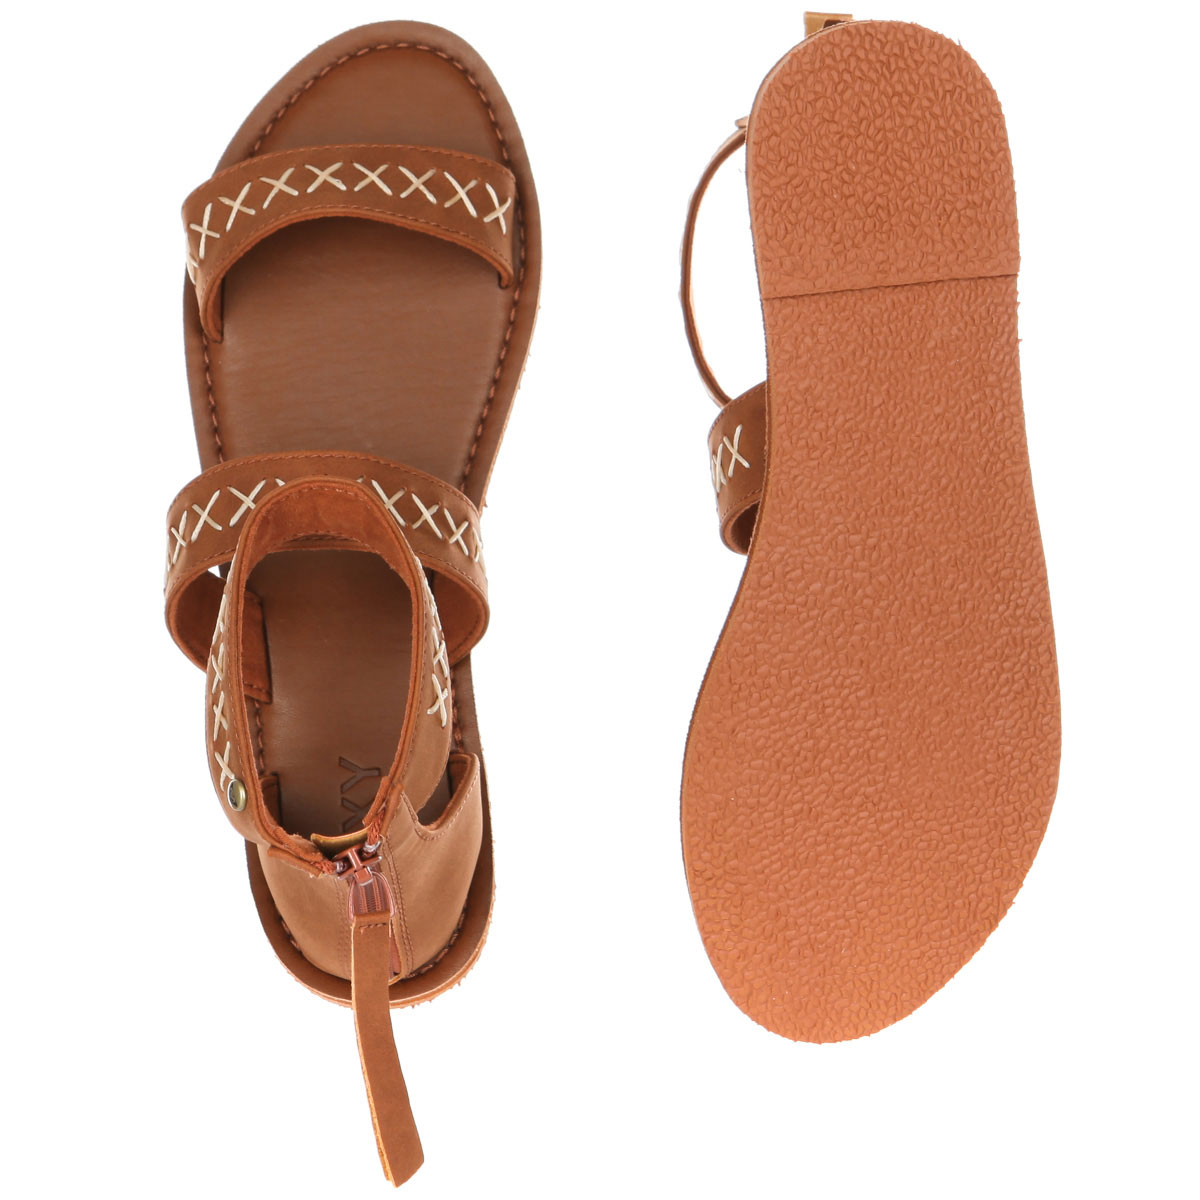 4769e8393ca0 Купить сандалии женские Roxy Natalie Brown (ARJL200621-BRN) в ...